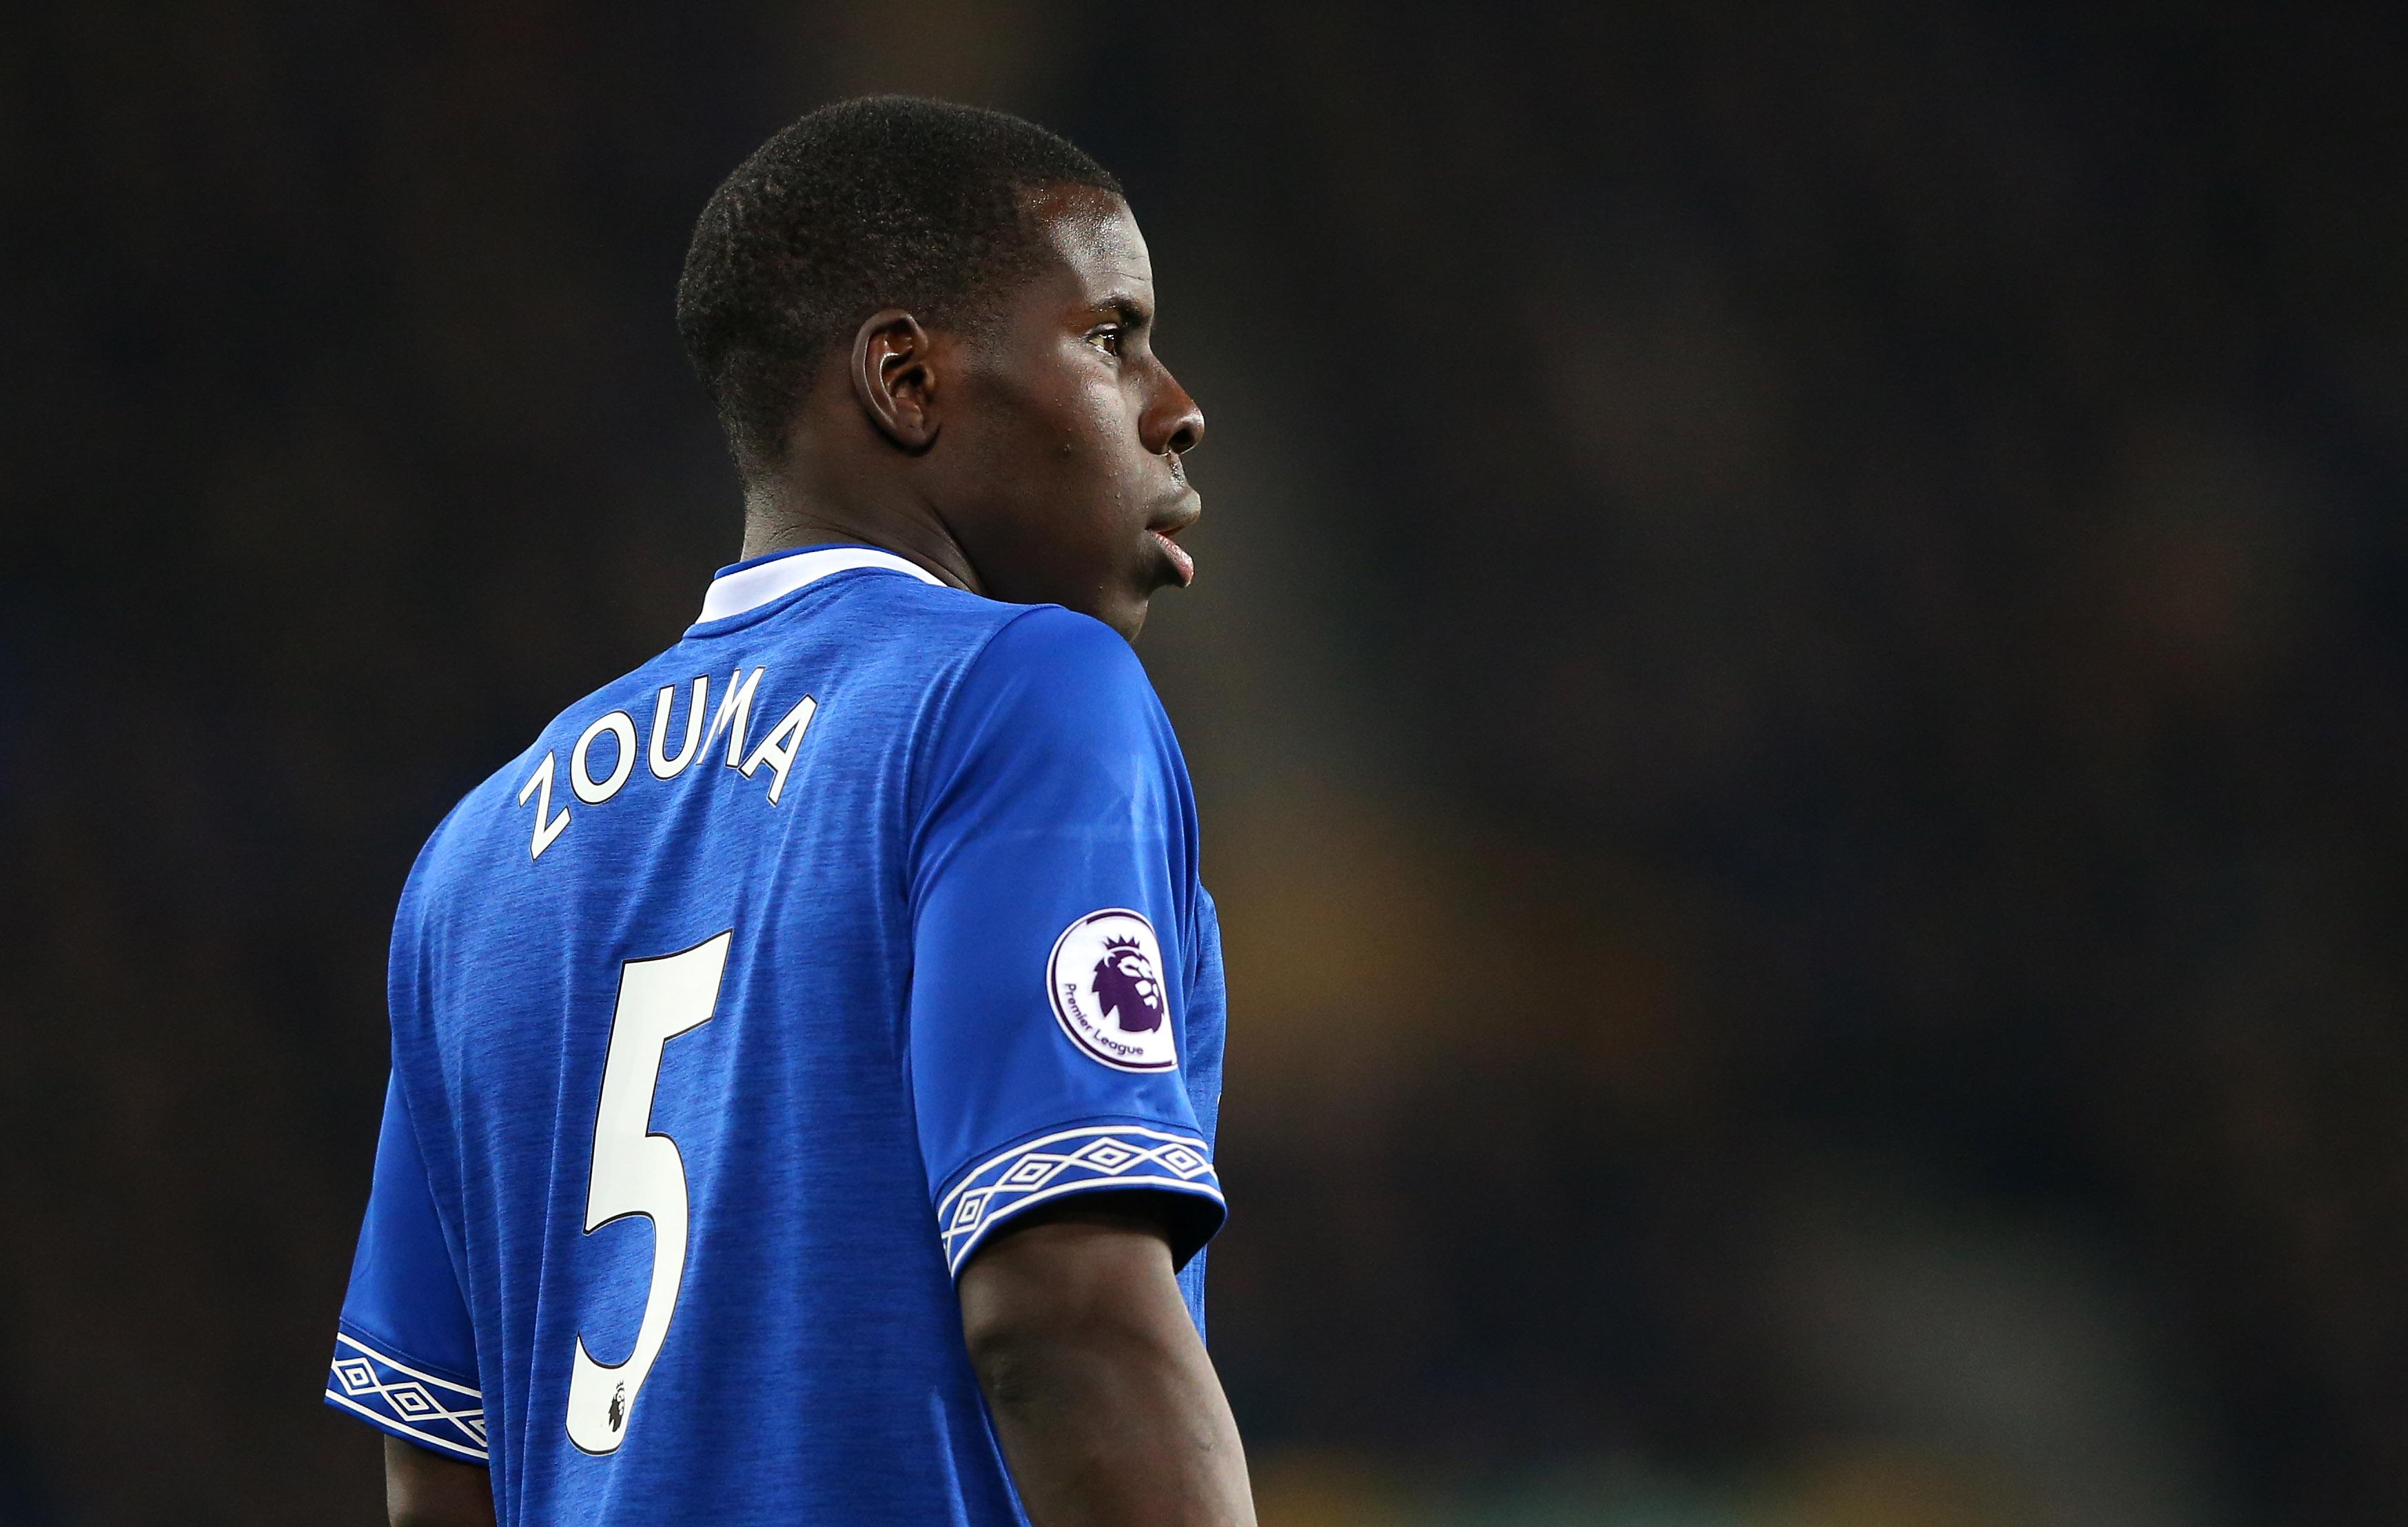 Friday's Toffee Bites: Zouma update, Ocampos, Bowen & Llorente transfer rumours